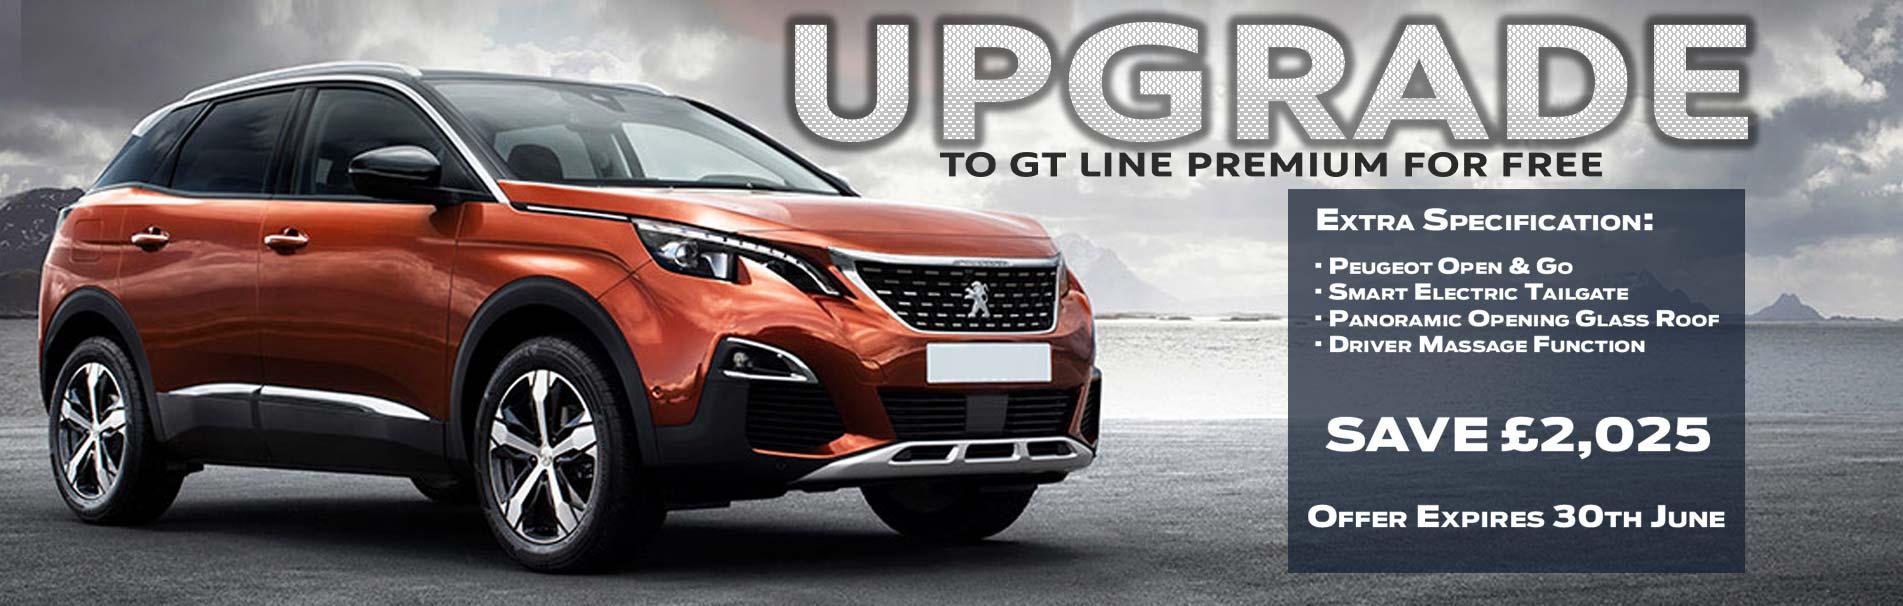 peugeot-3008-suv-free-upgrade-gt-line-premium-save-2025-sli